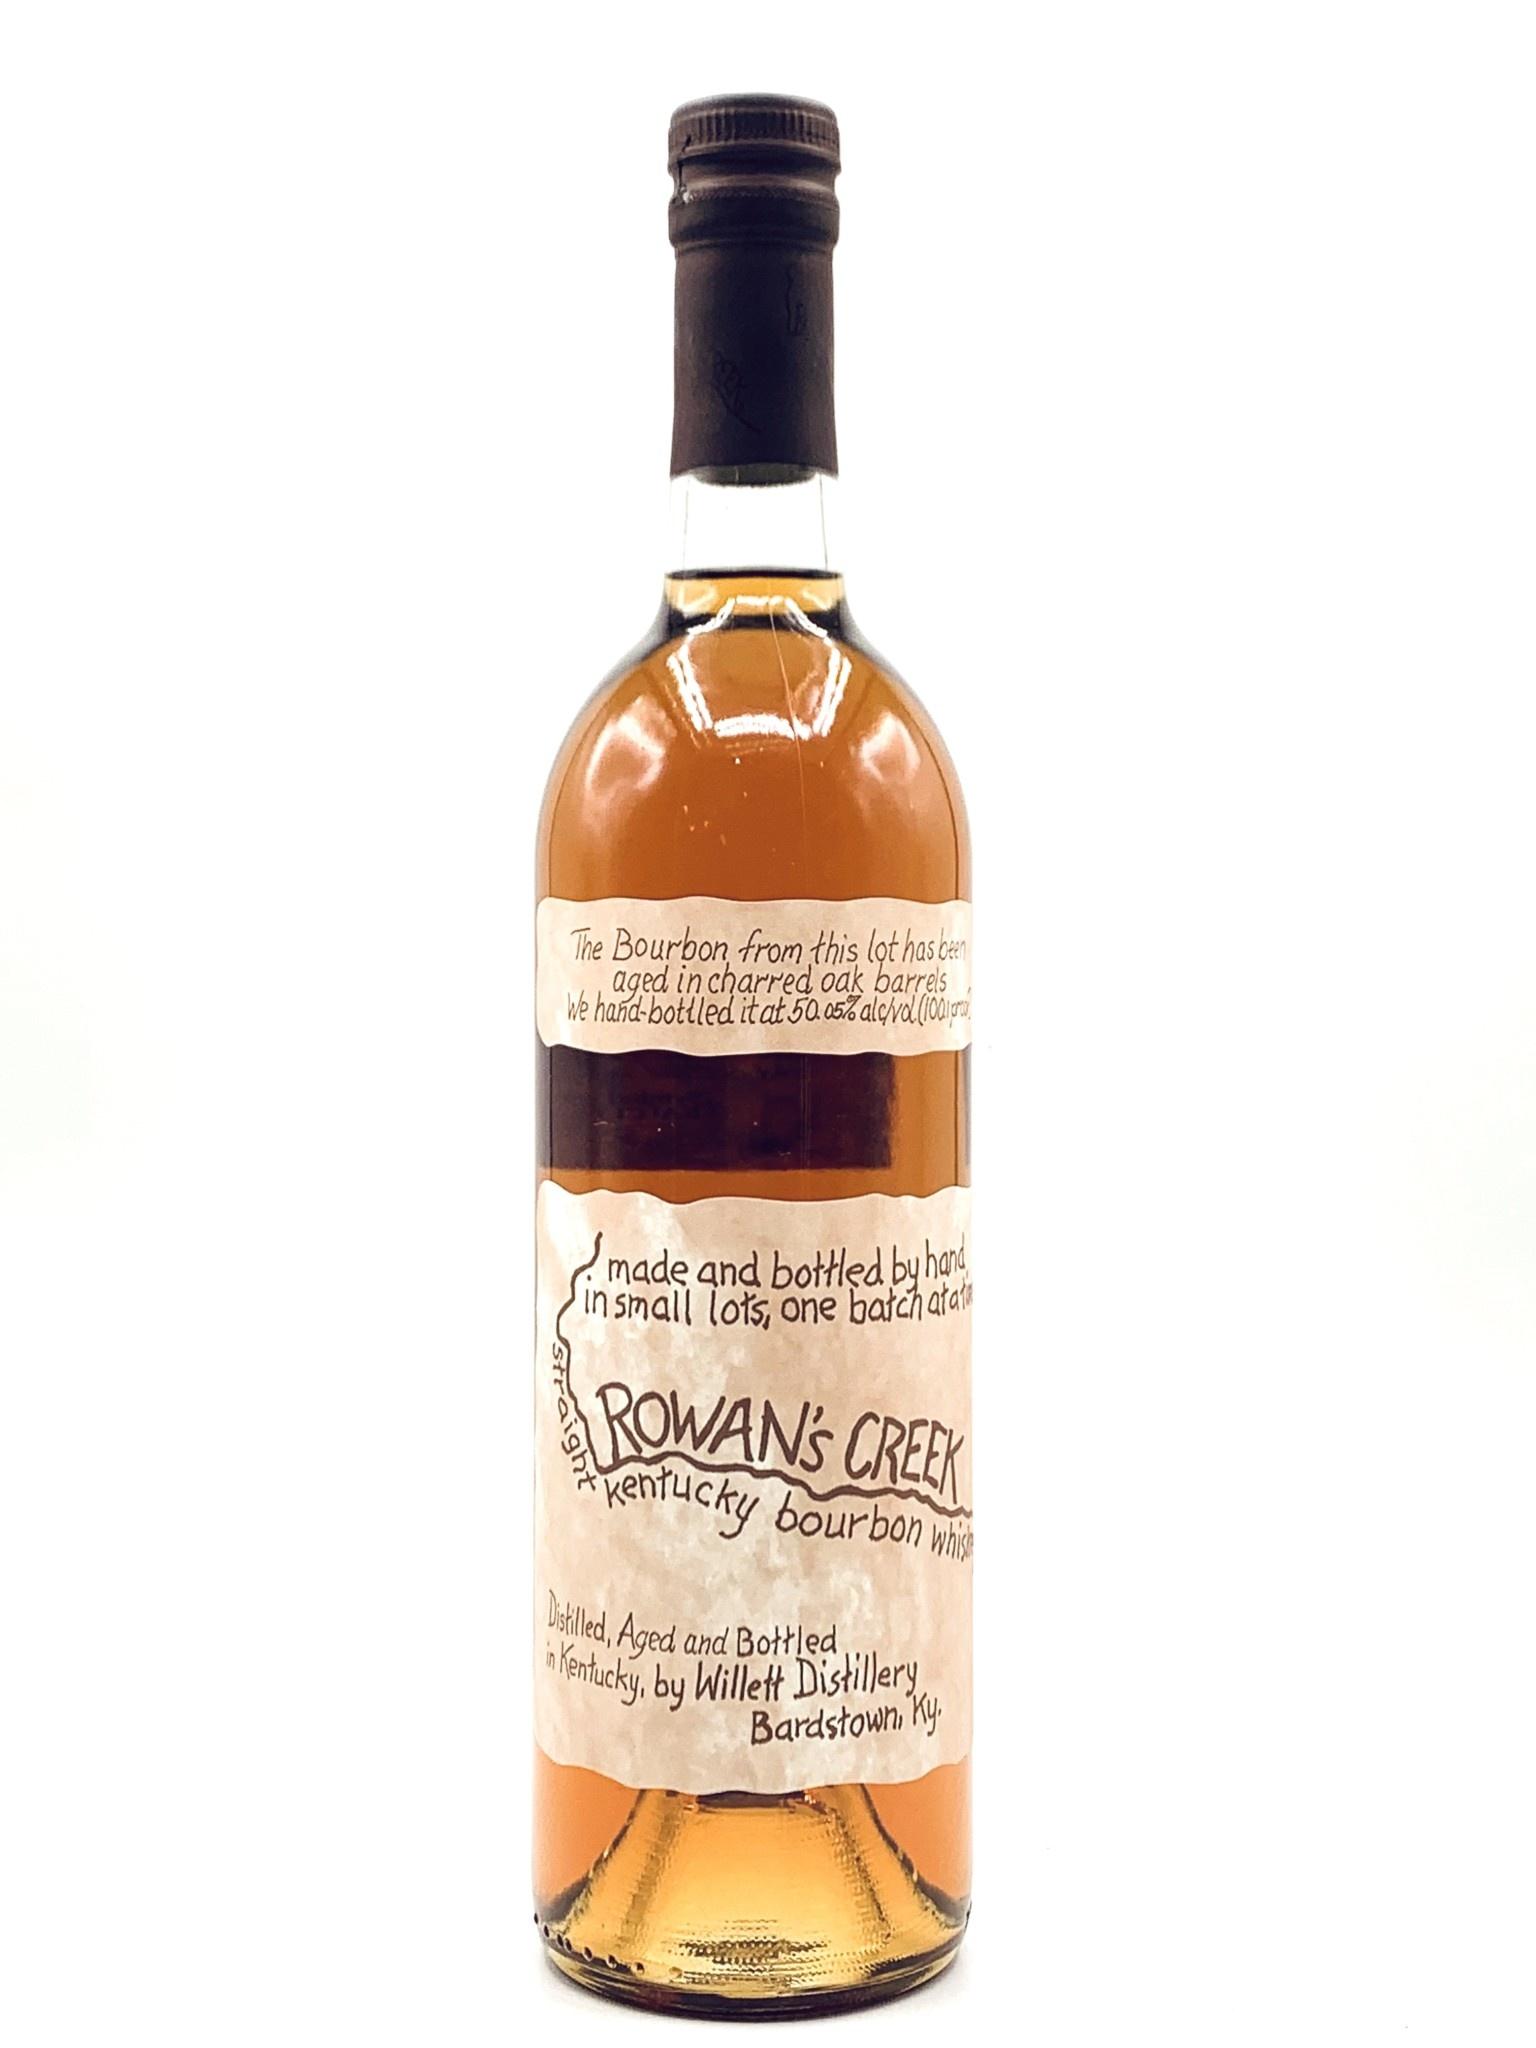 Rowan's Creek Small Batch Kentucky Straight Bourbon 750ml (100 Proof)